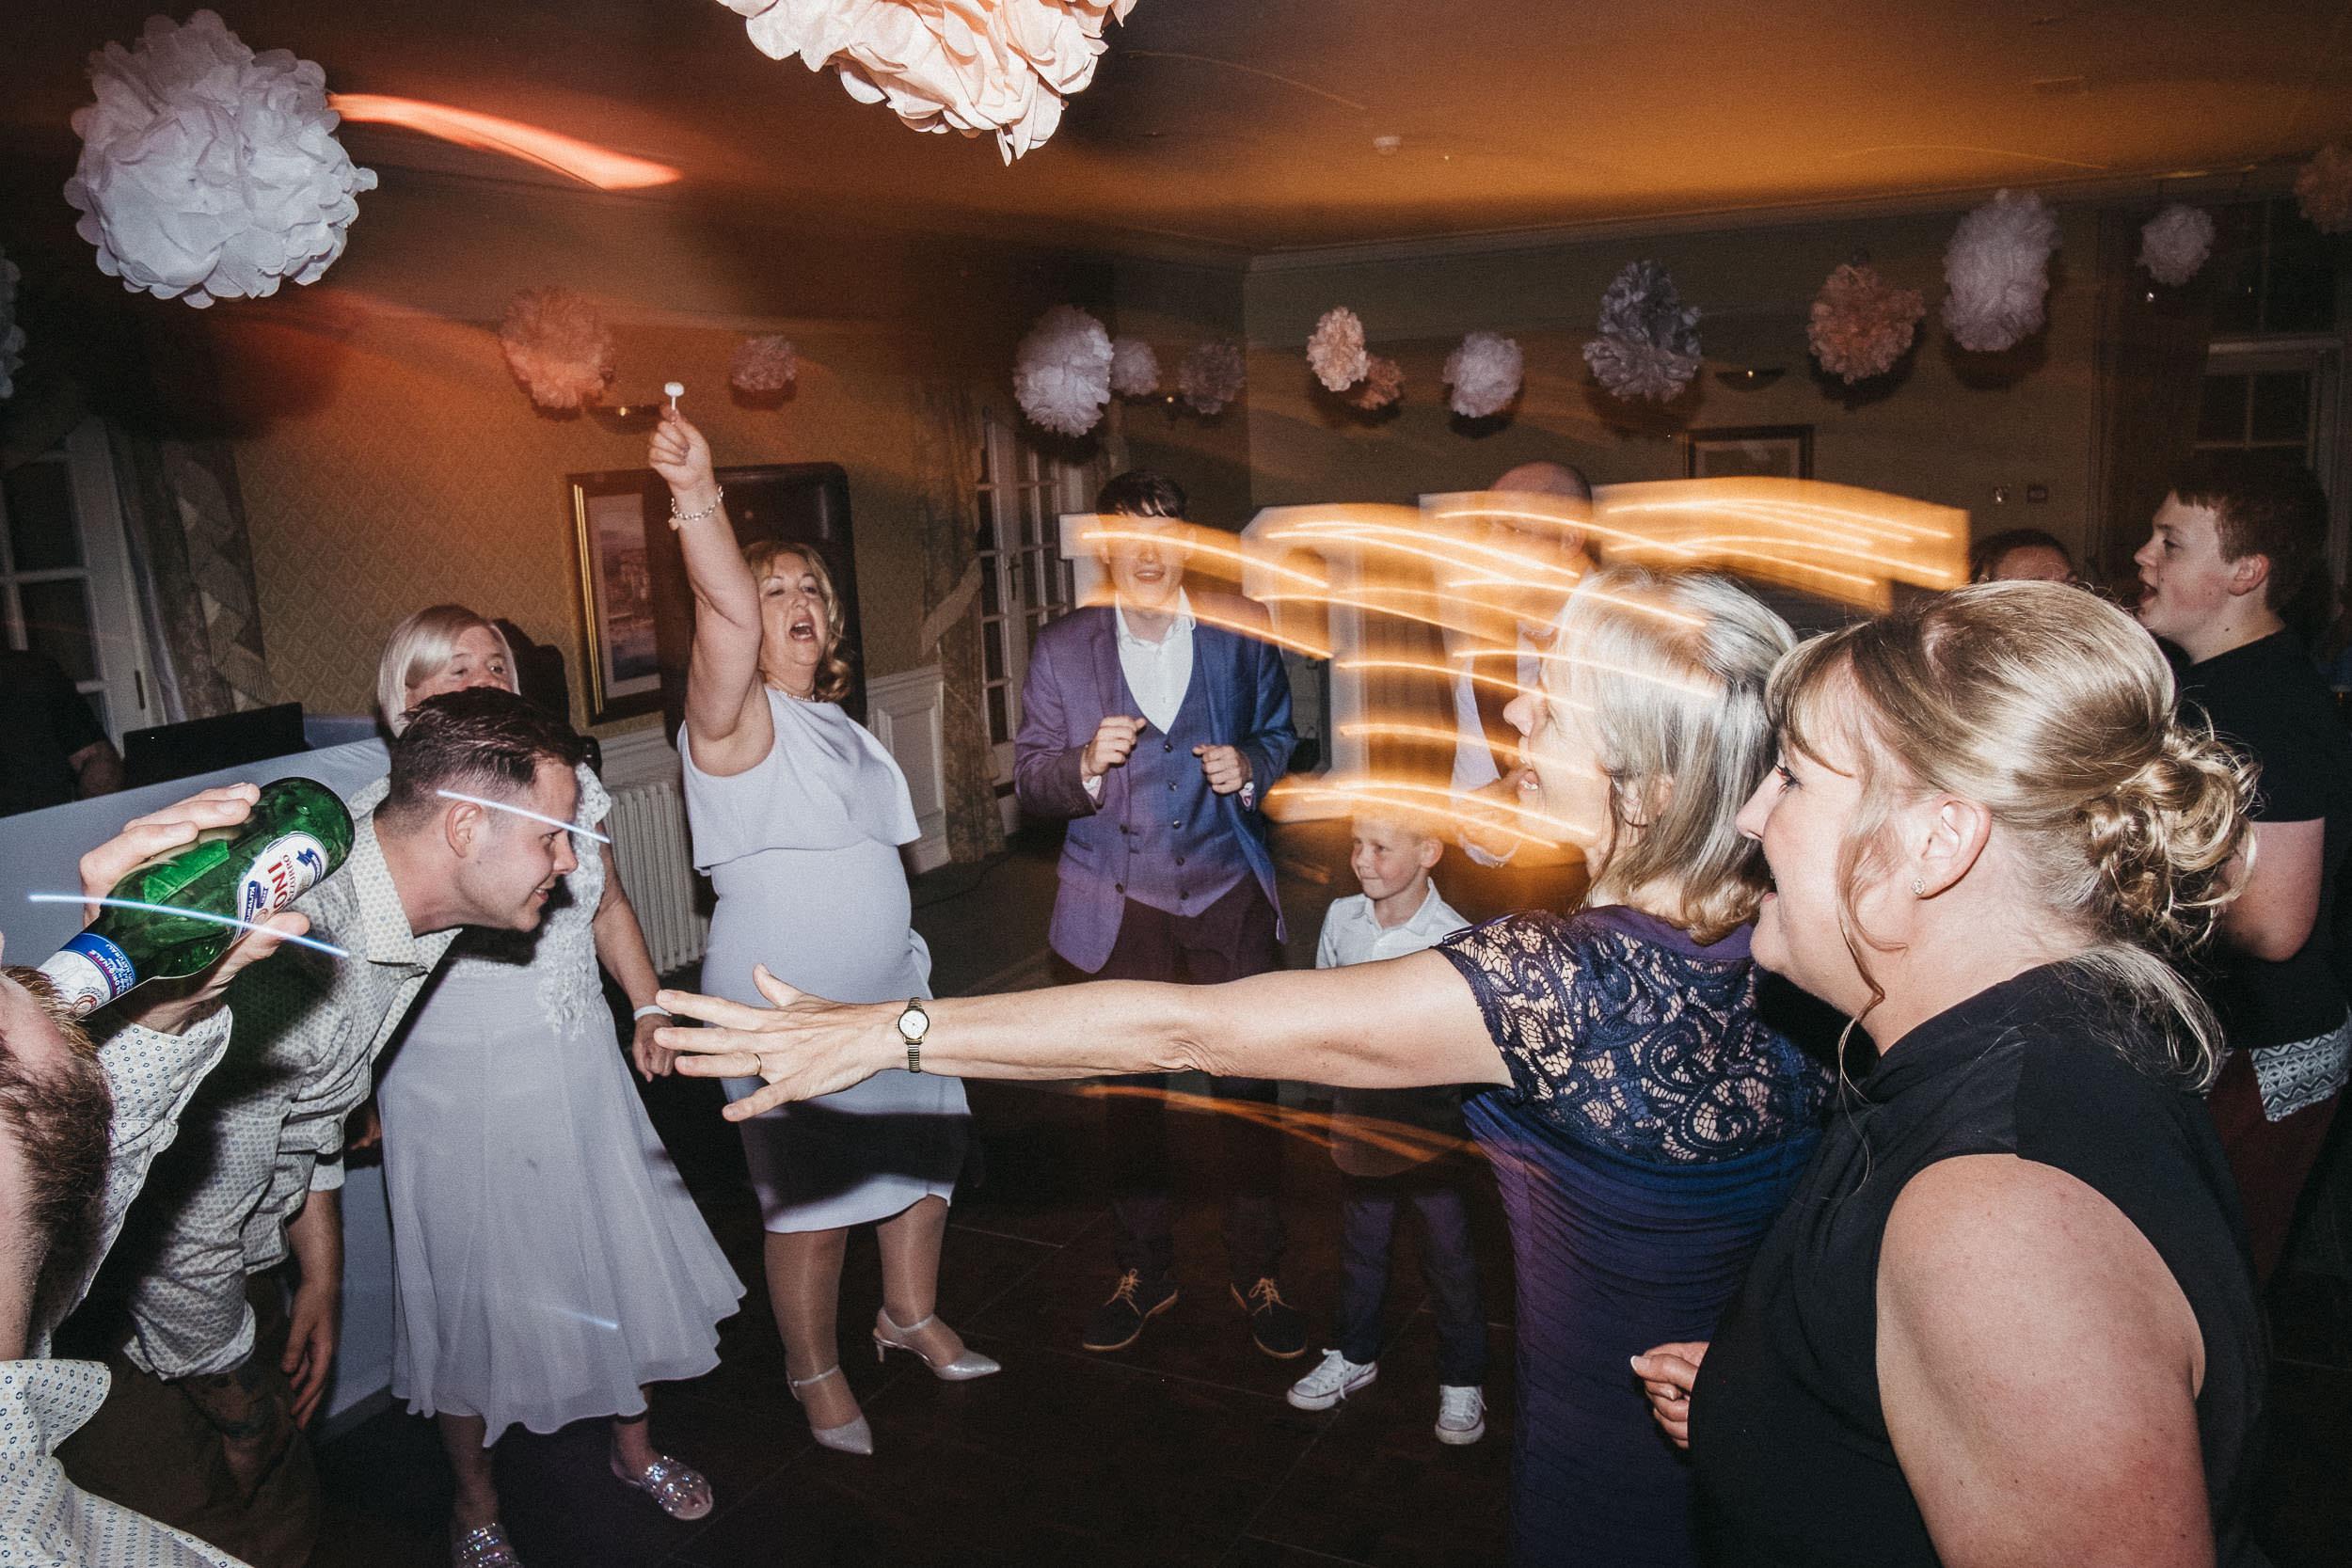 Wedding guests dancing energetically at wedding